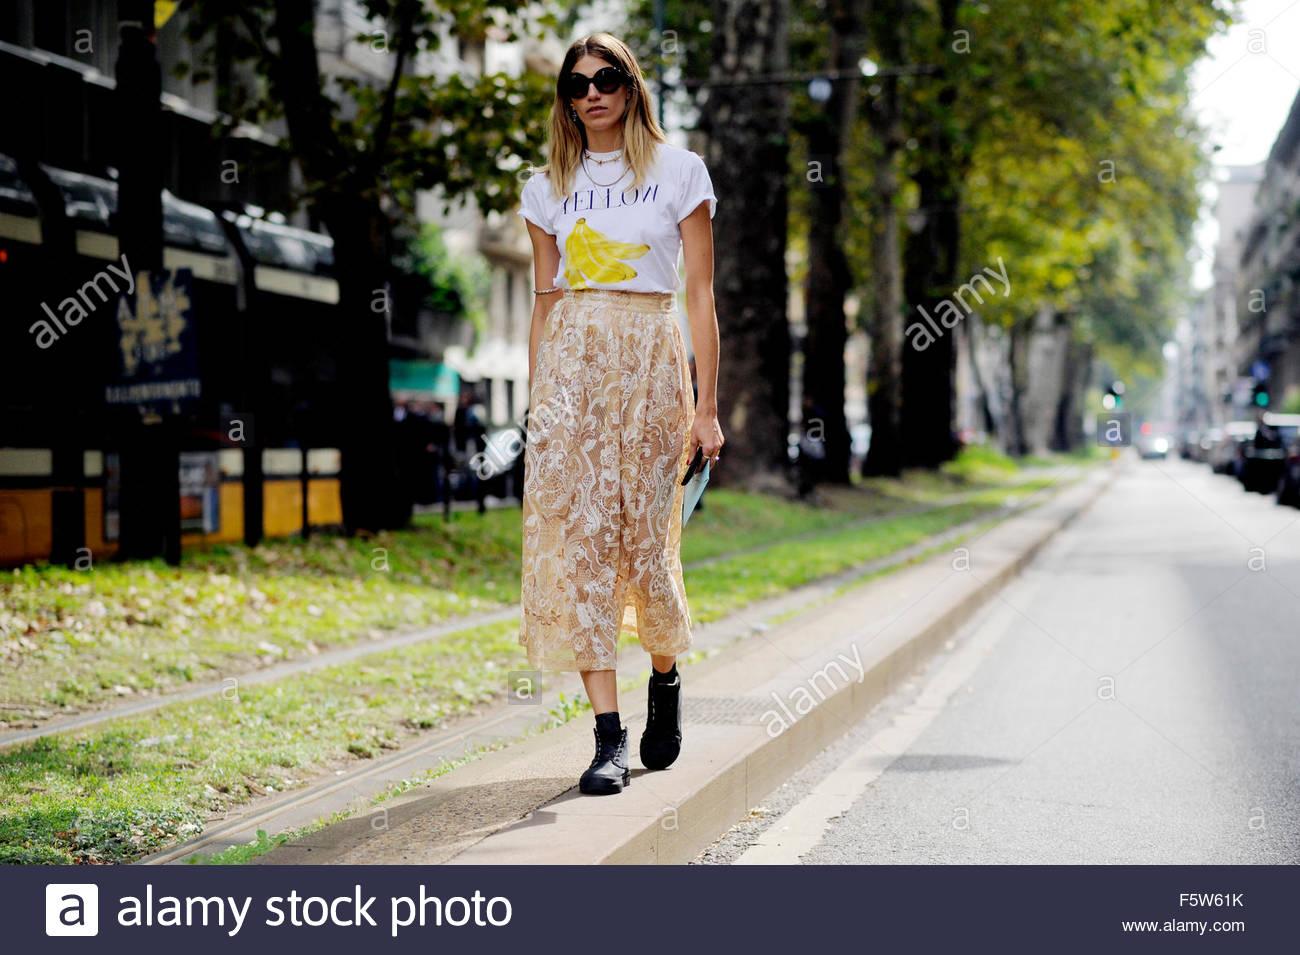 Veronika Heilbrunner On Viale Piave, after Dolce & Gabbana ready to wear Spring Summer 2016. Milan fashion Week - Stock Image